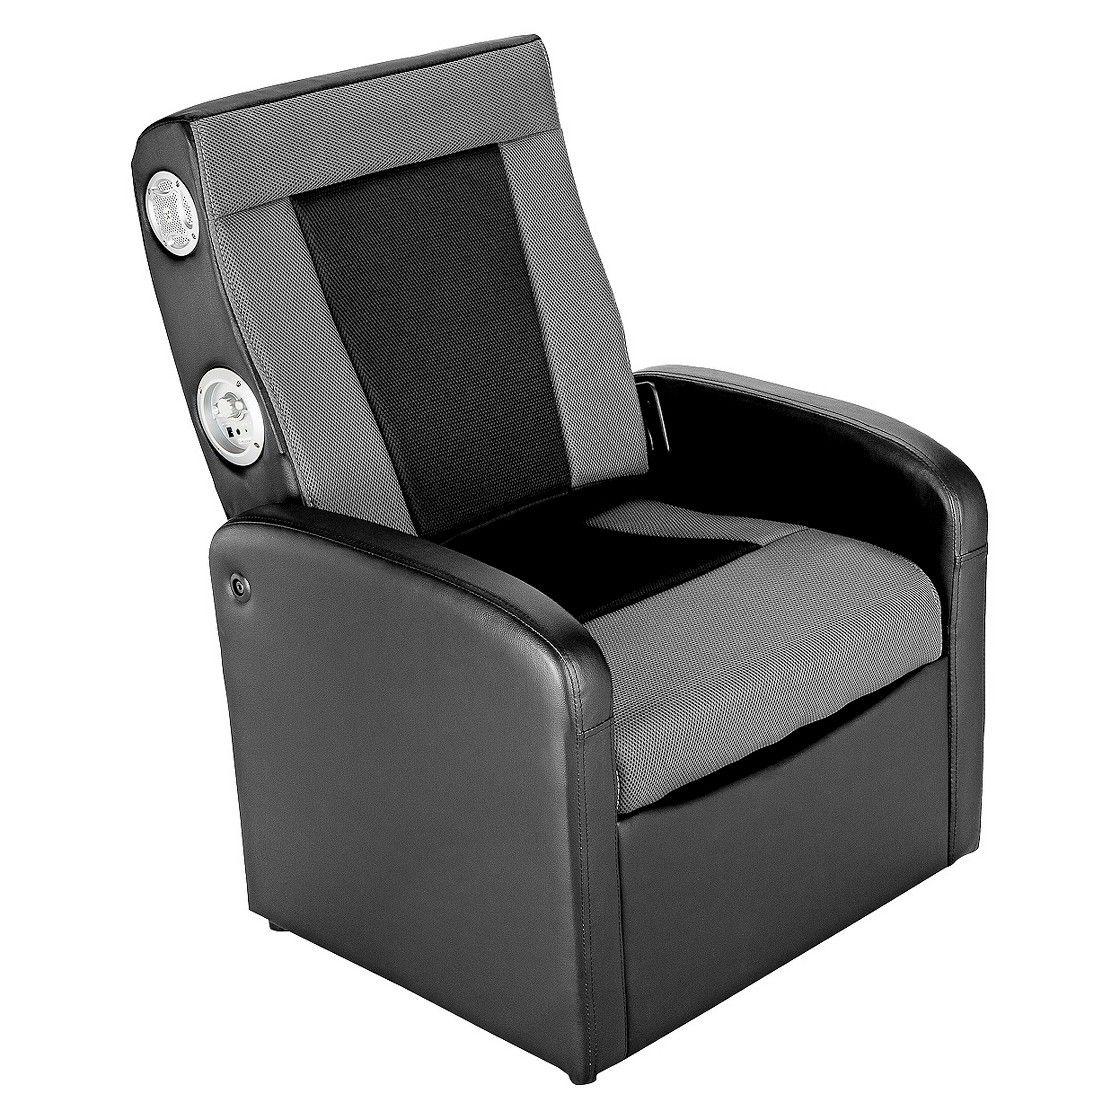 ACE BAYOU XRocker Gaming Chair Black/Grey Bean bag